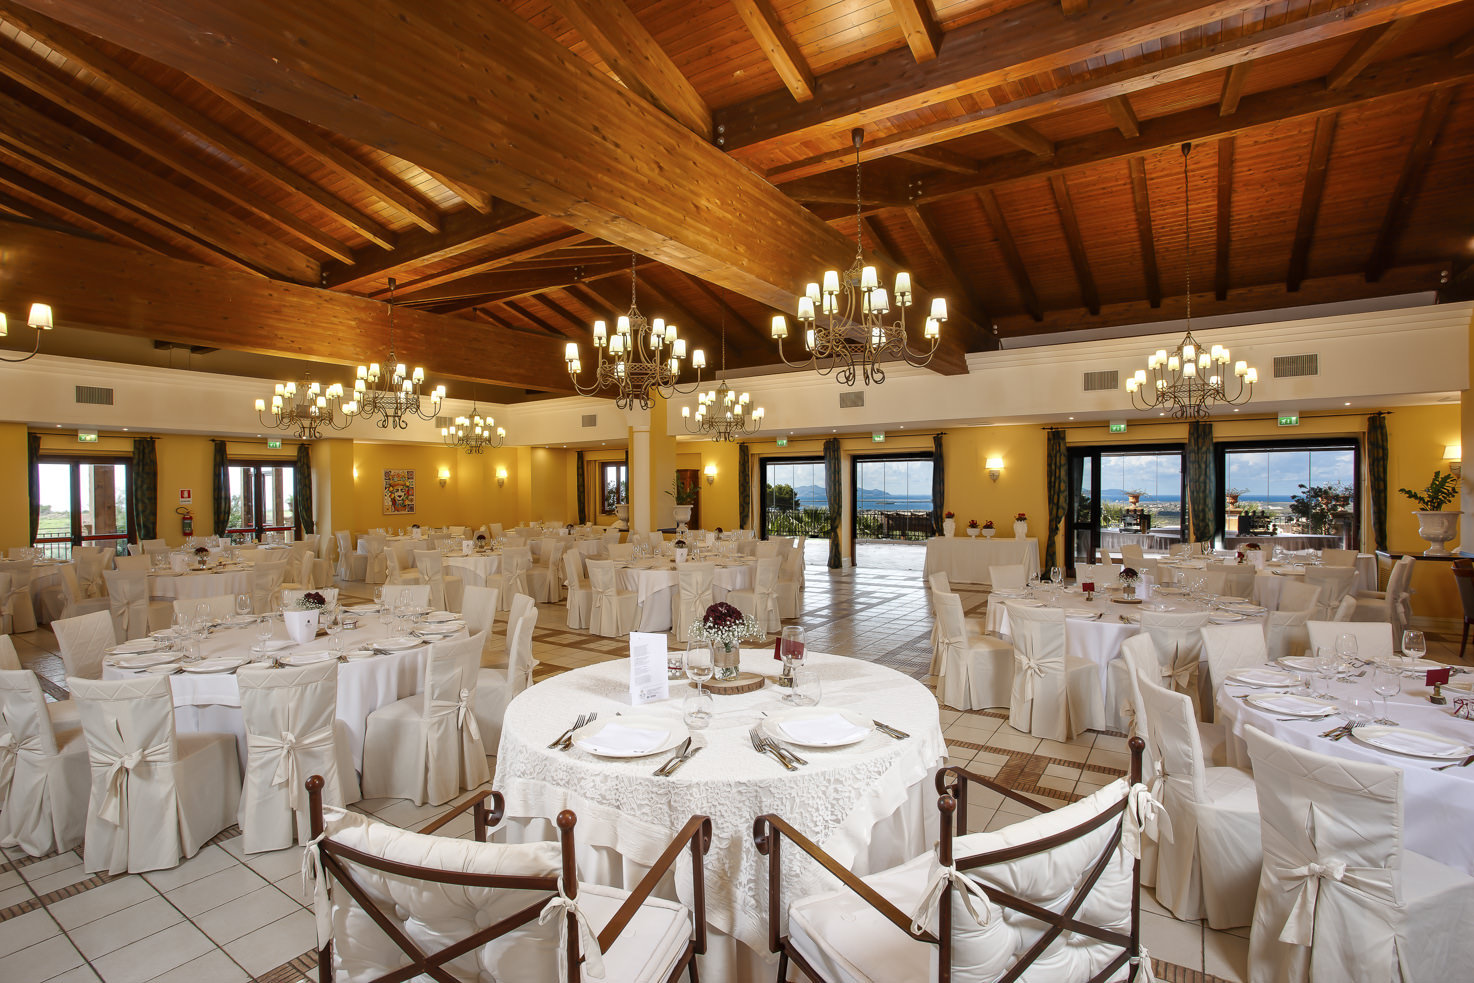 Restaurant for wedding receptions